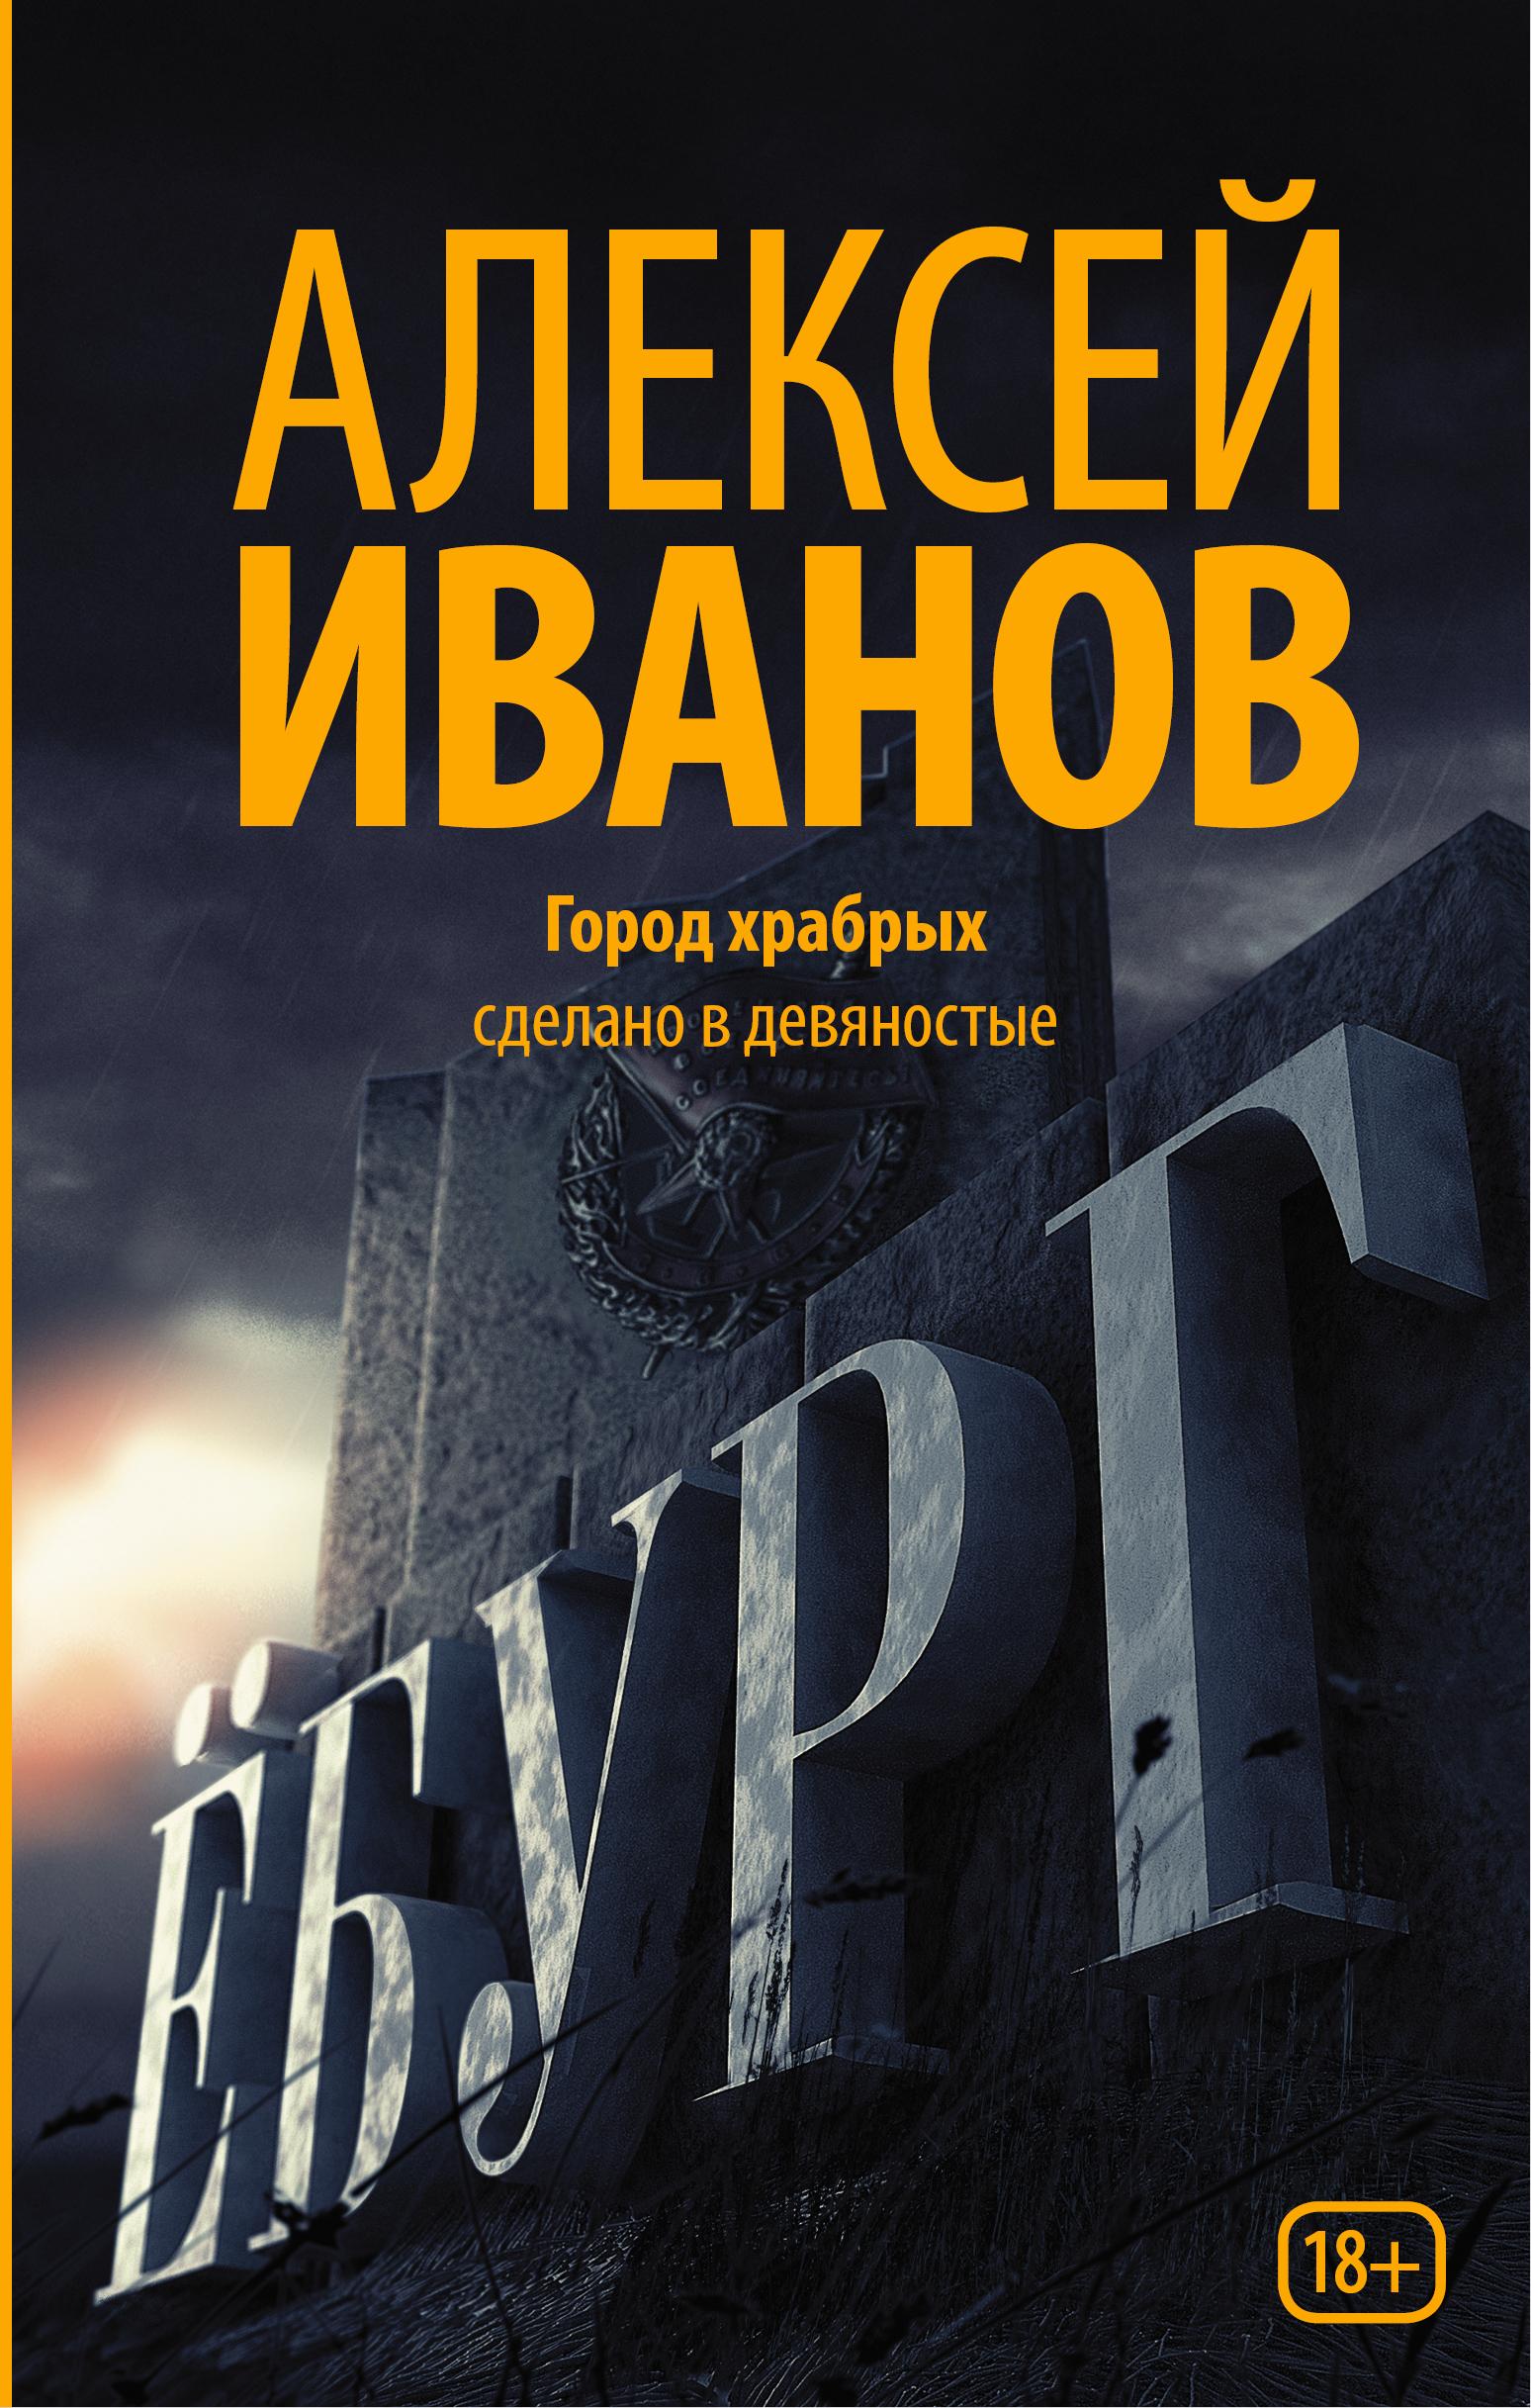 Иванов А.В. Ёбург